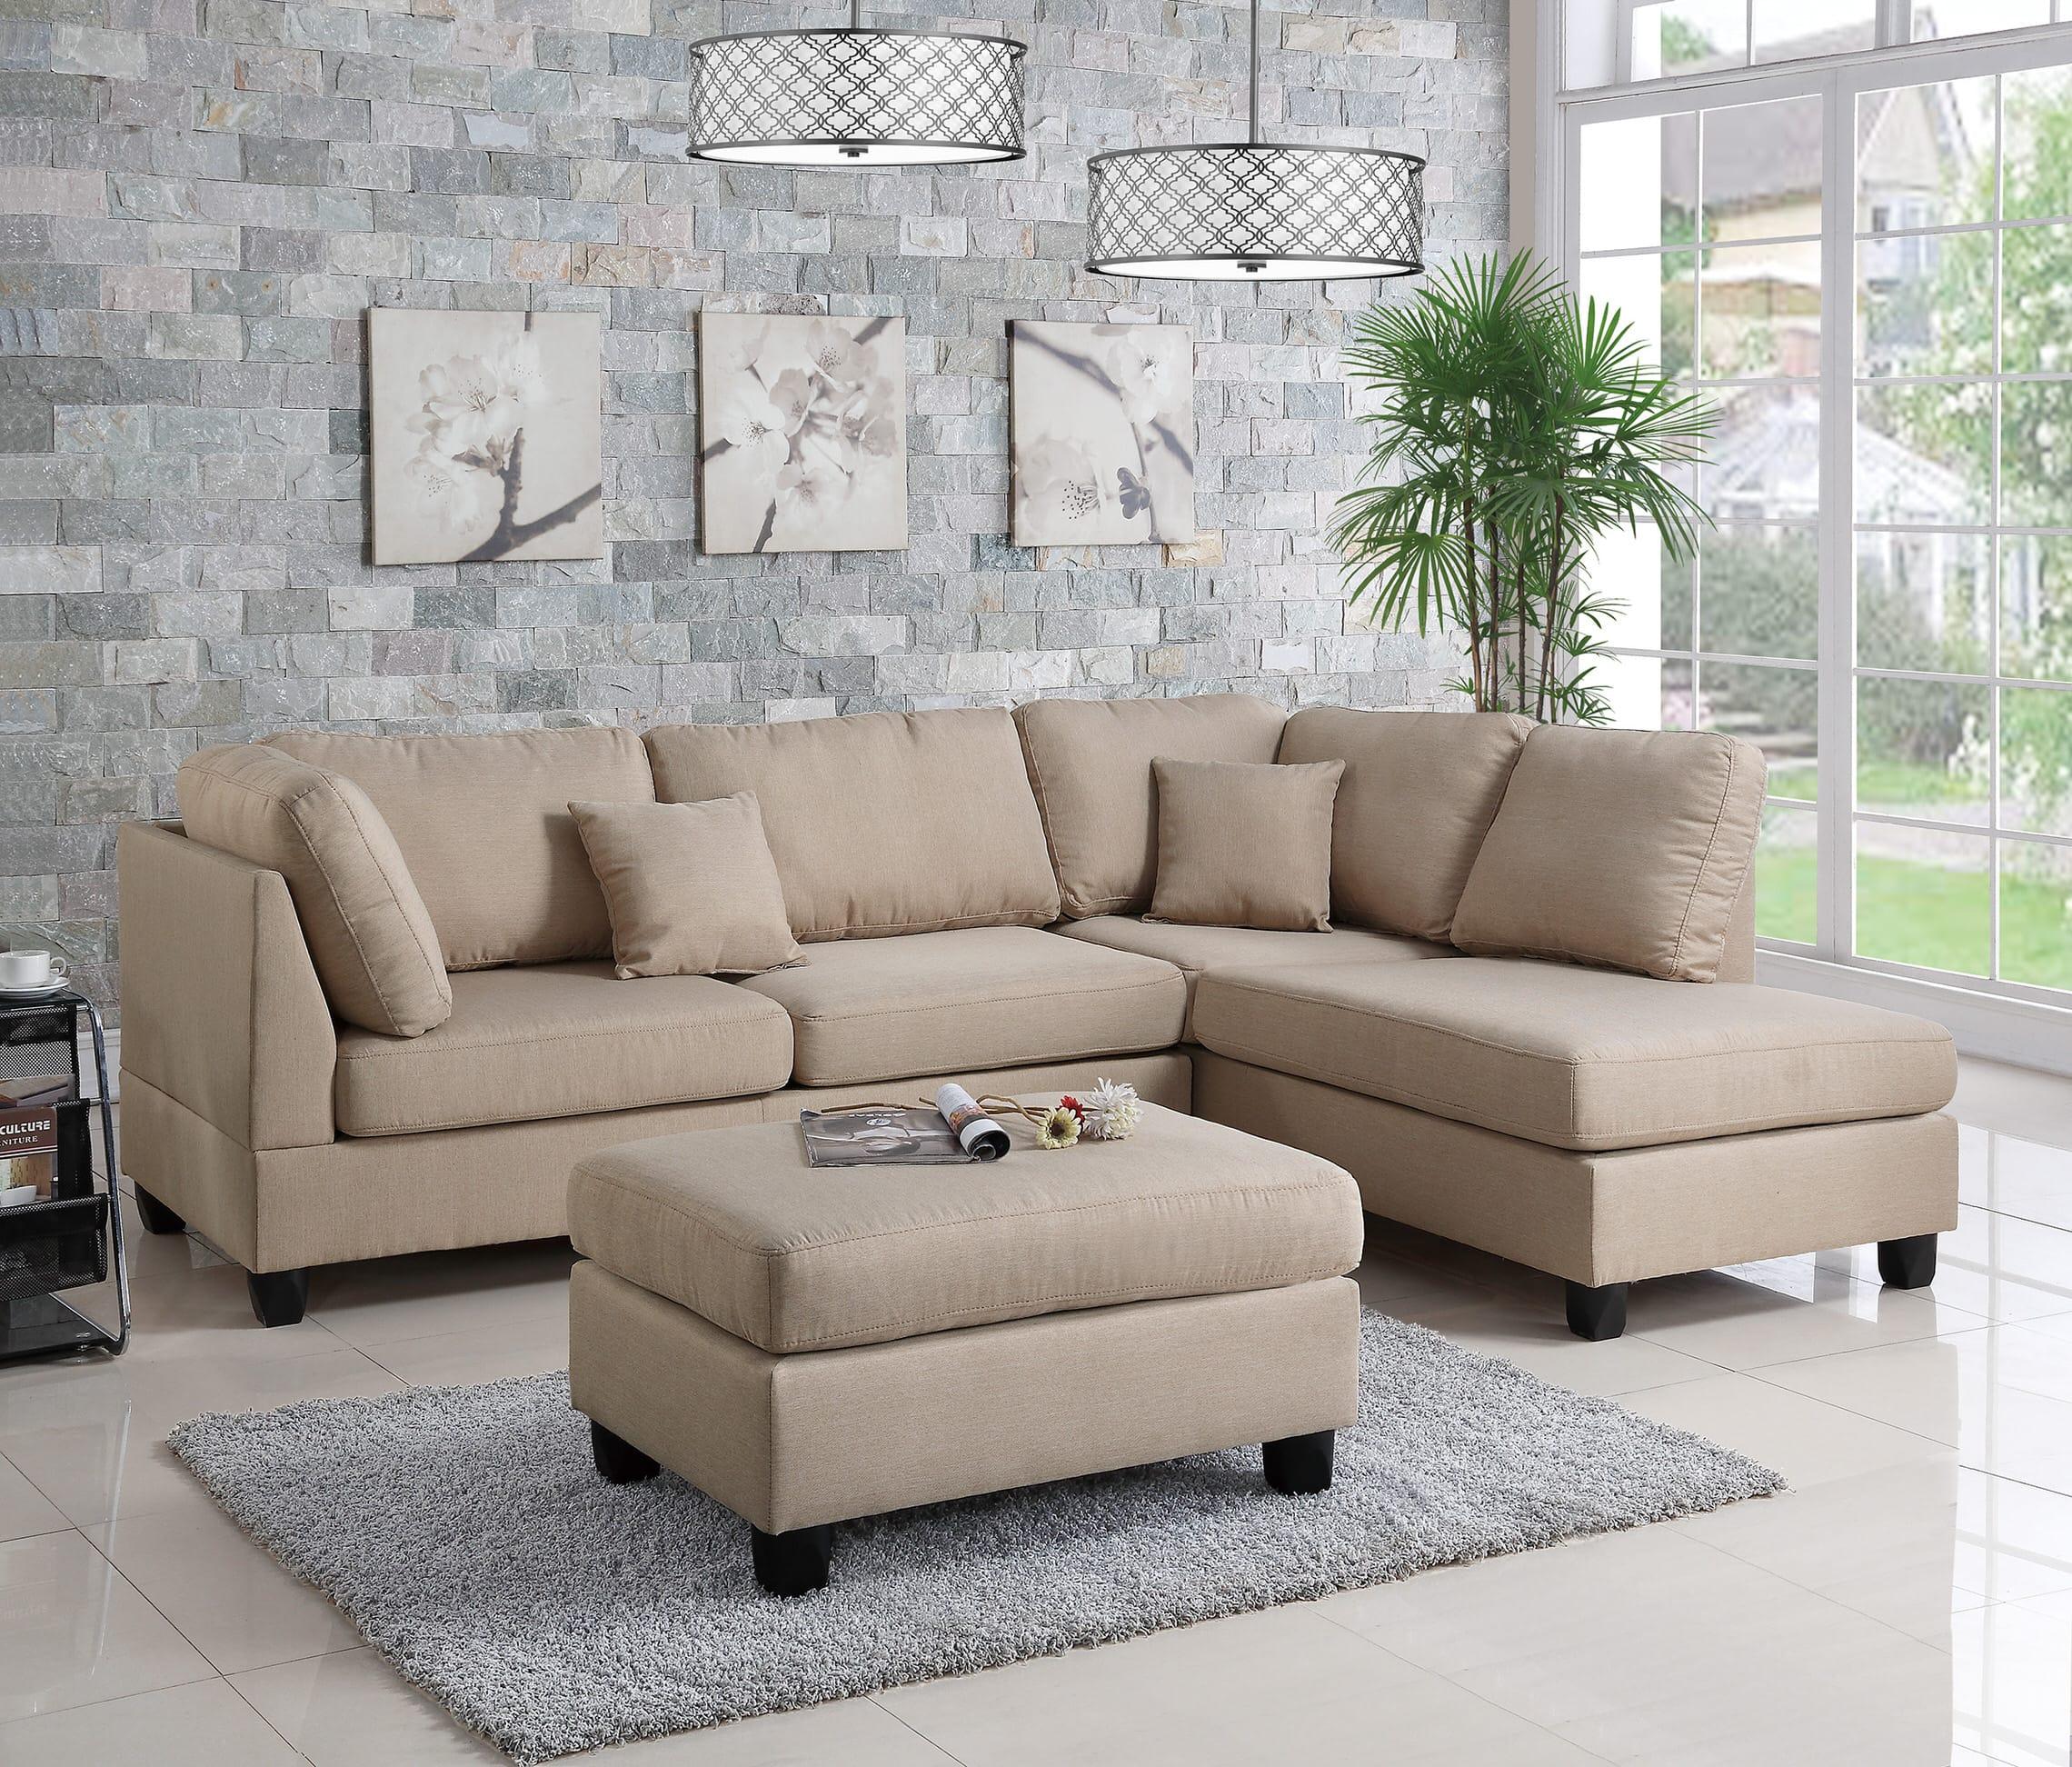 F7605 sand 2 pcs sectional sofa set by poundex - Sofa color arena ...